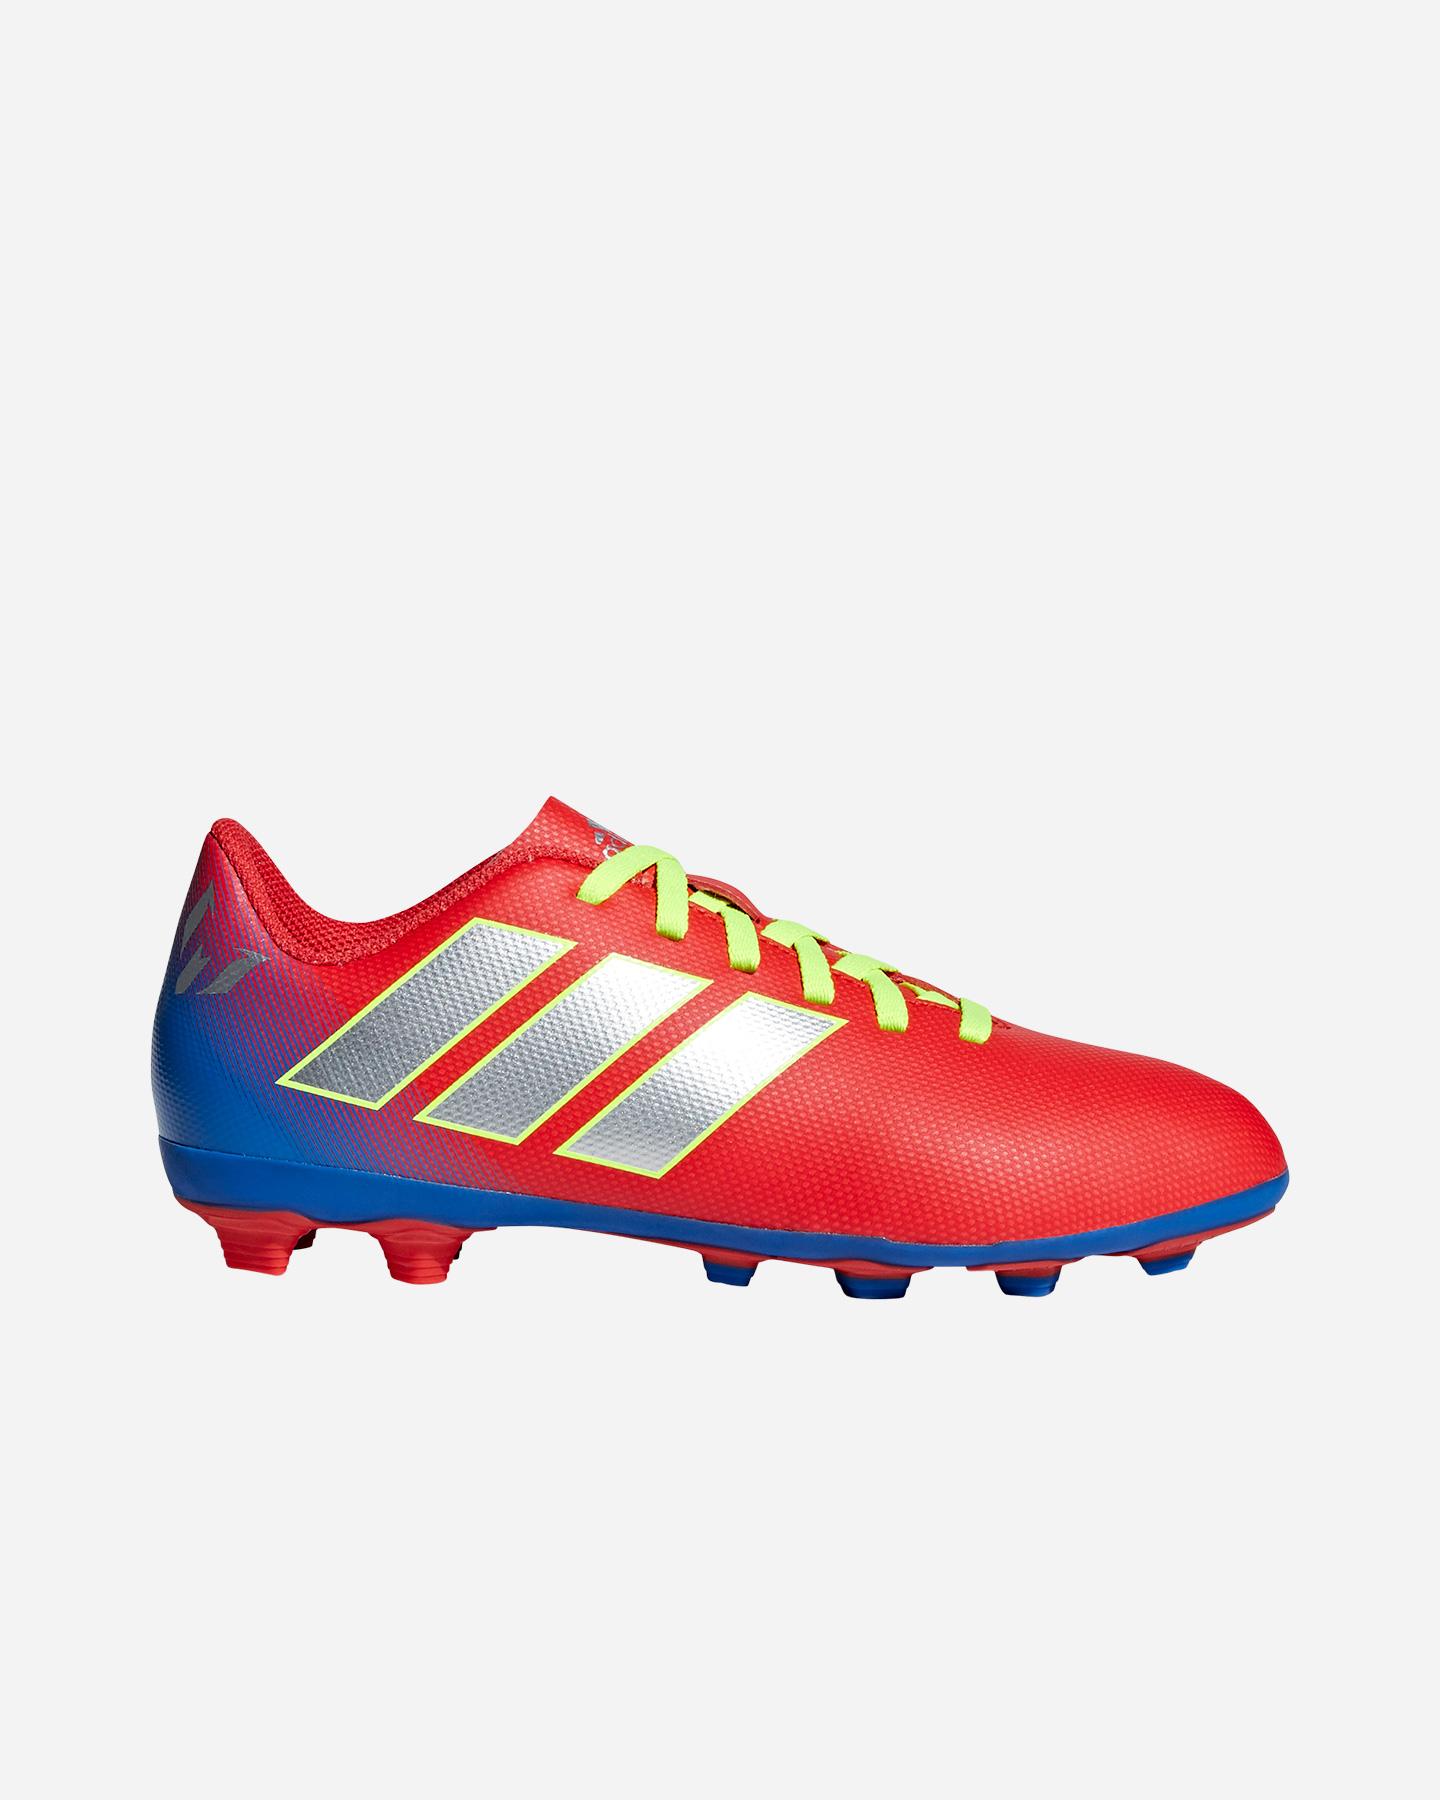 scarpe calcio adidas messi bambino